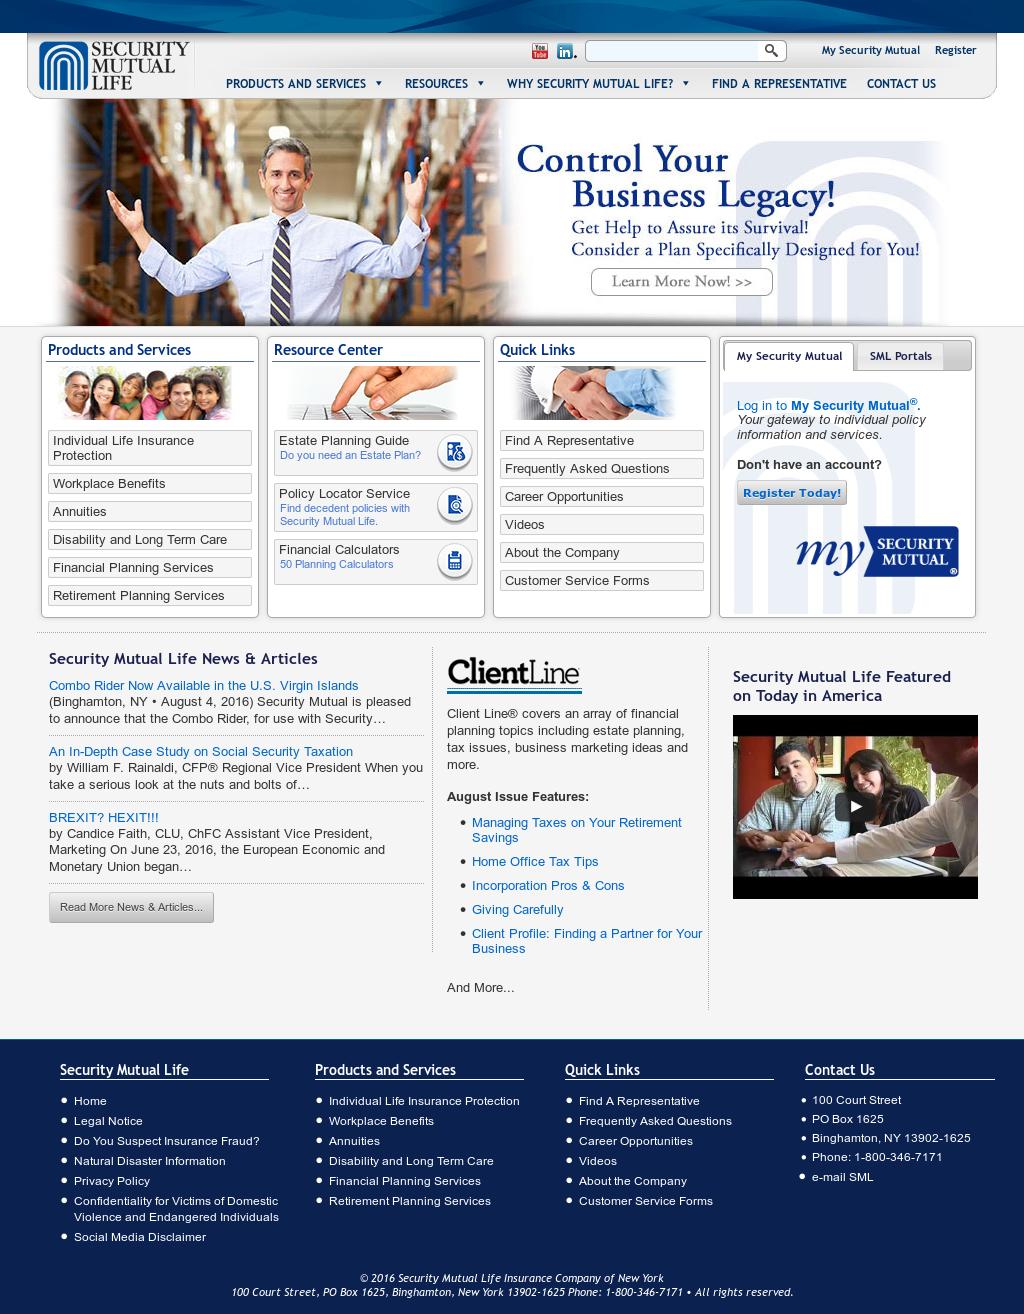 SMLNY Competitors, Revenue and Employees - Owler Company Profile